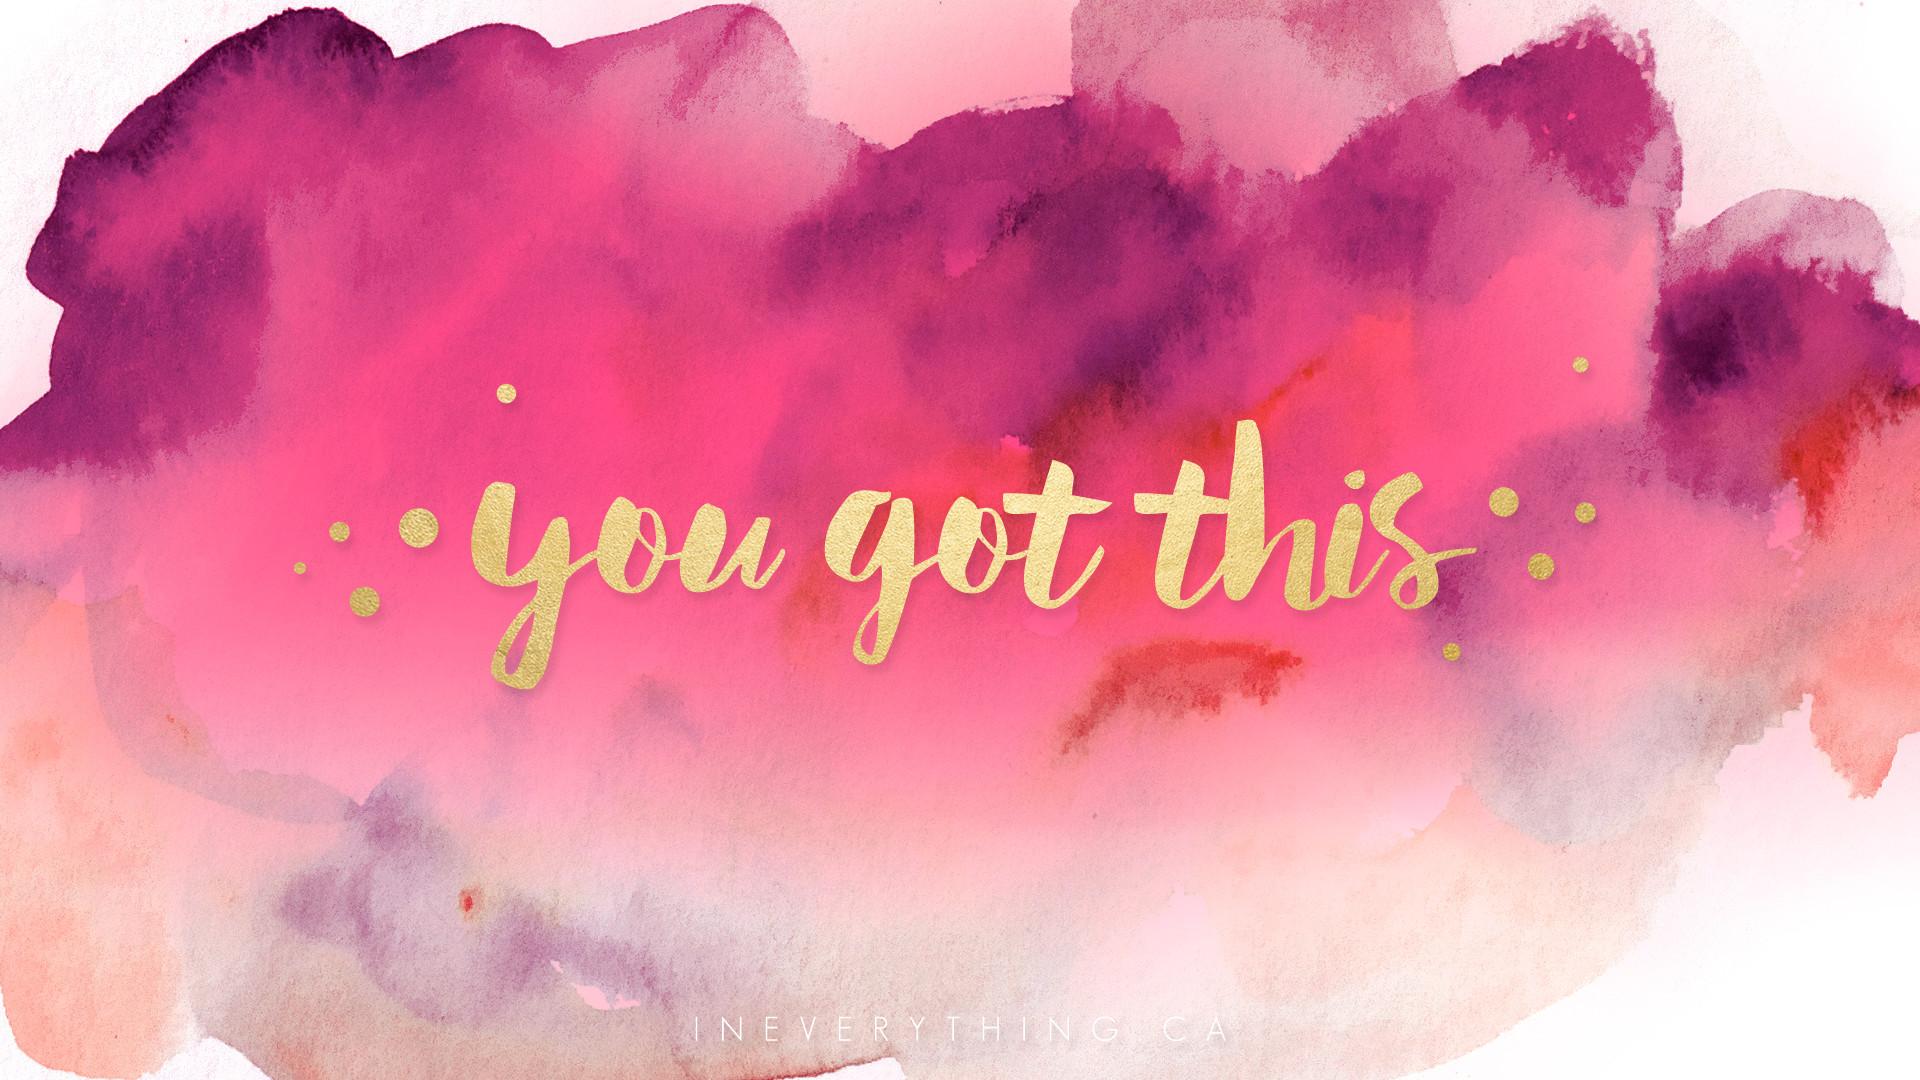 Best 25+ Laptop wallpaper ideas on Pinterest   Mac wallpaper, Laptop  backgrounds and Macbook wallpaper